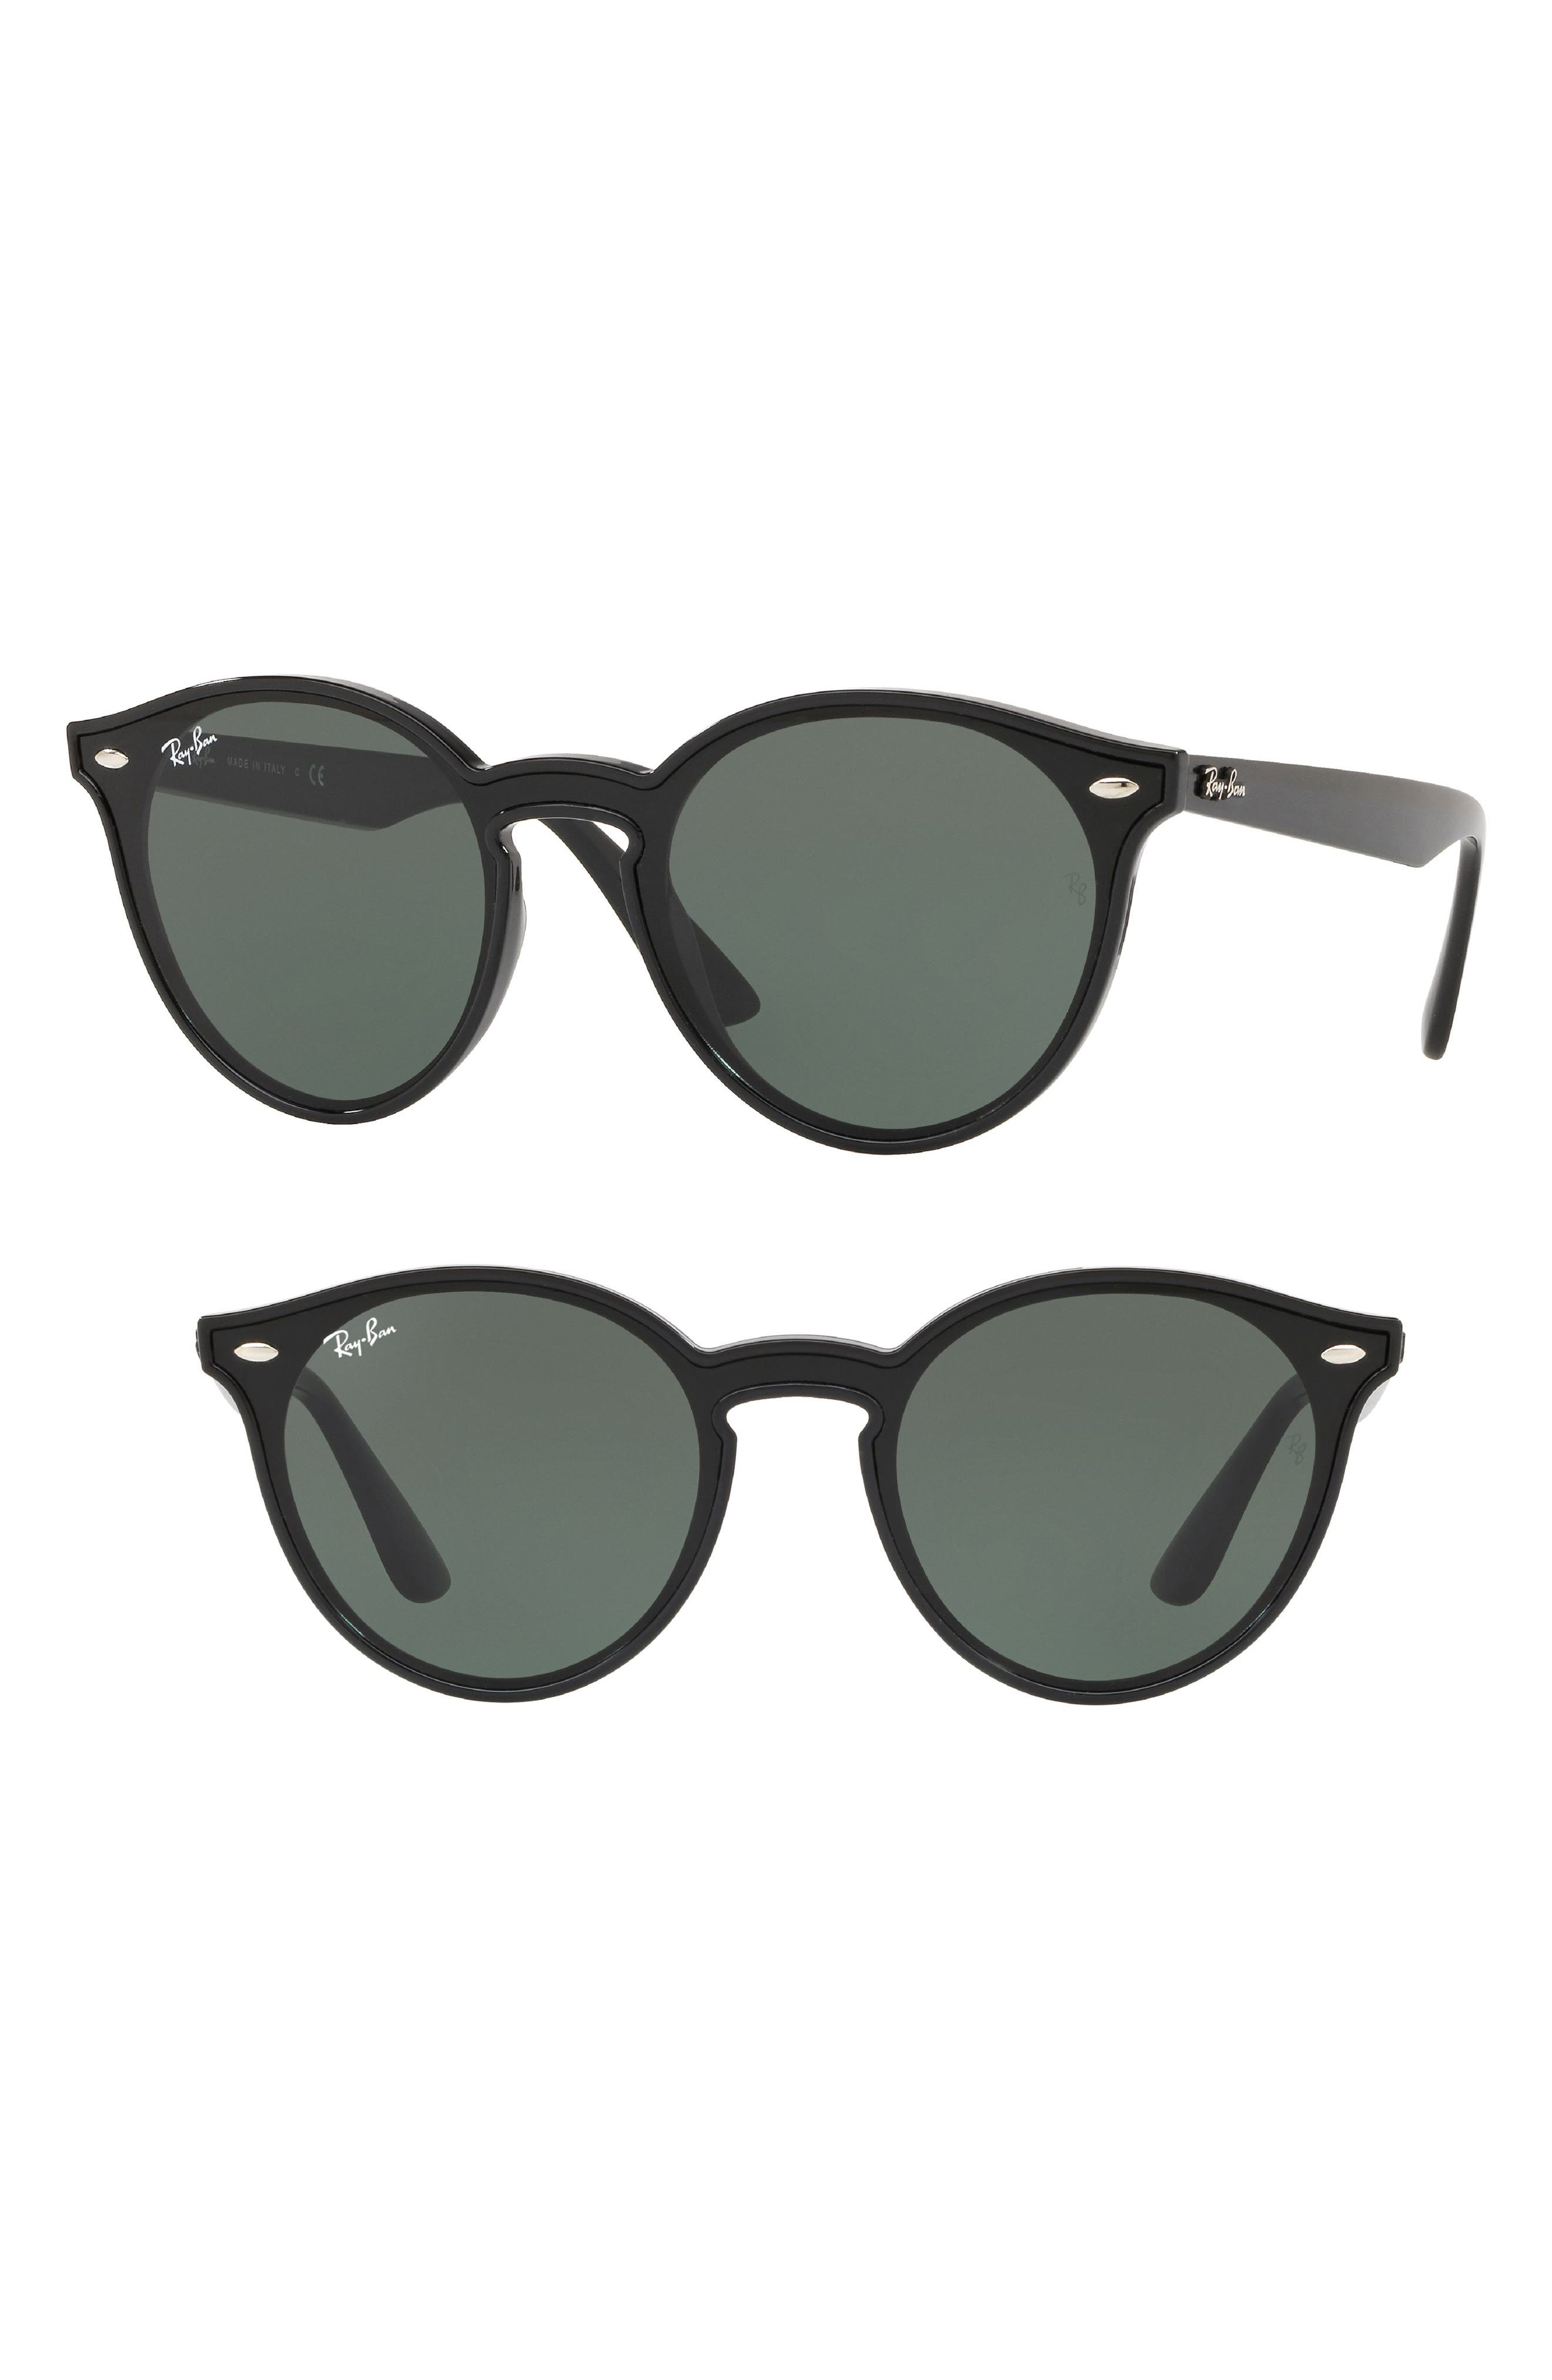 RAY-BAN, Blaze 37mm Round Sunglasses, Main thumbnail 1, color, BLACK SOLID